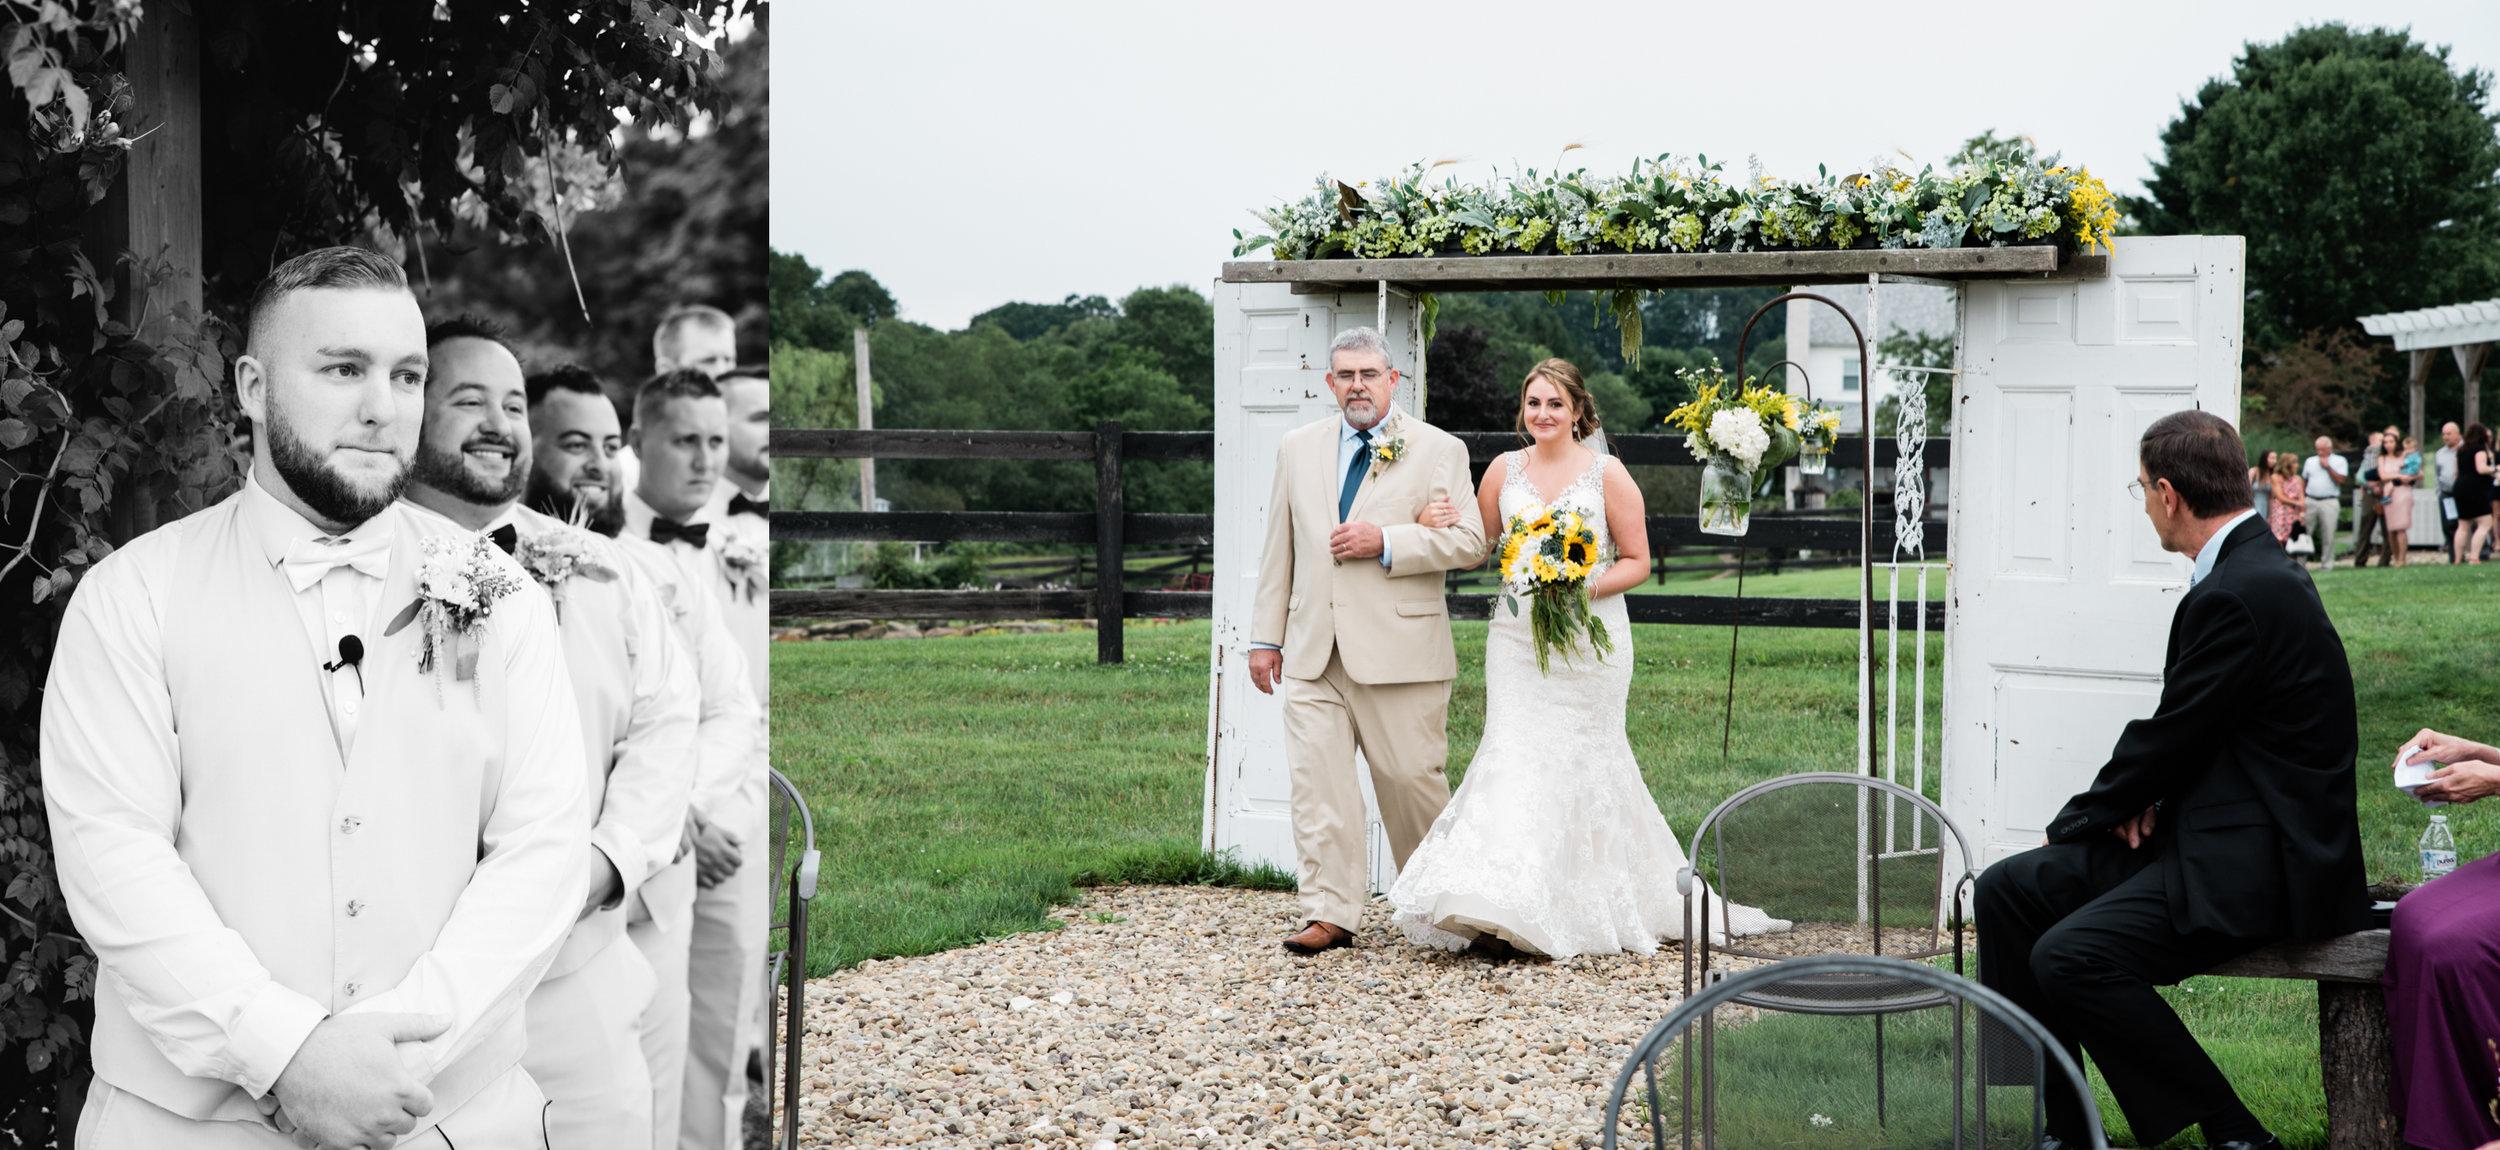 wedding ceremony photography The Hayloft of PA, wedding photographer.jpg